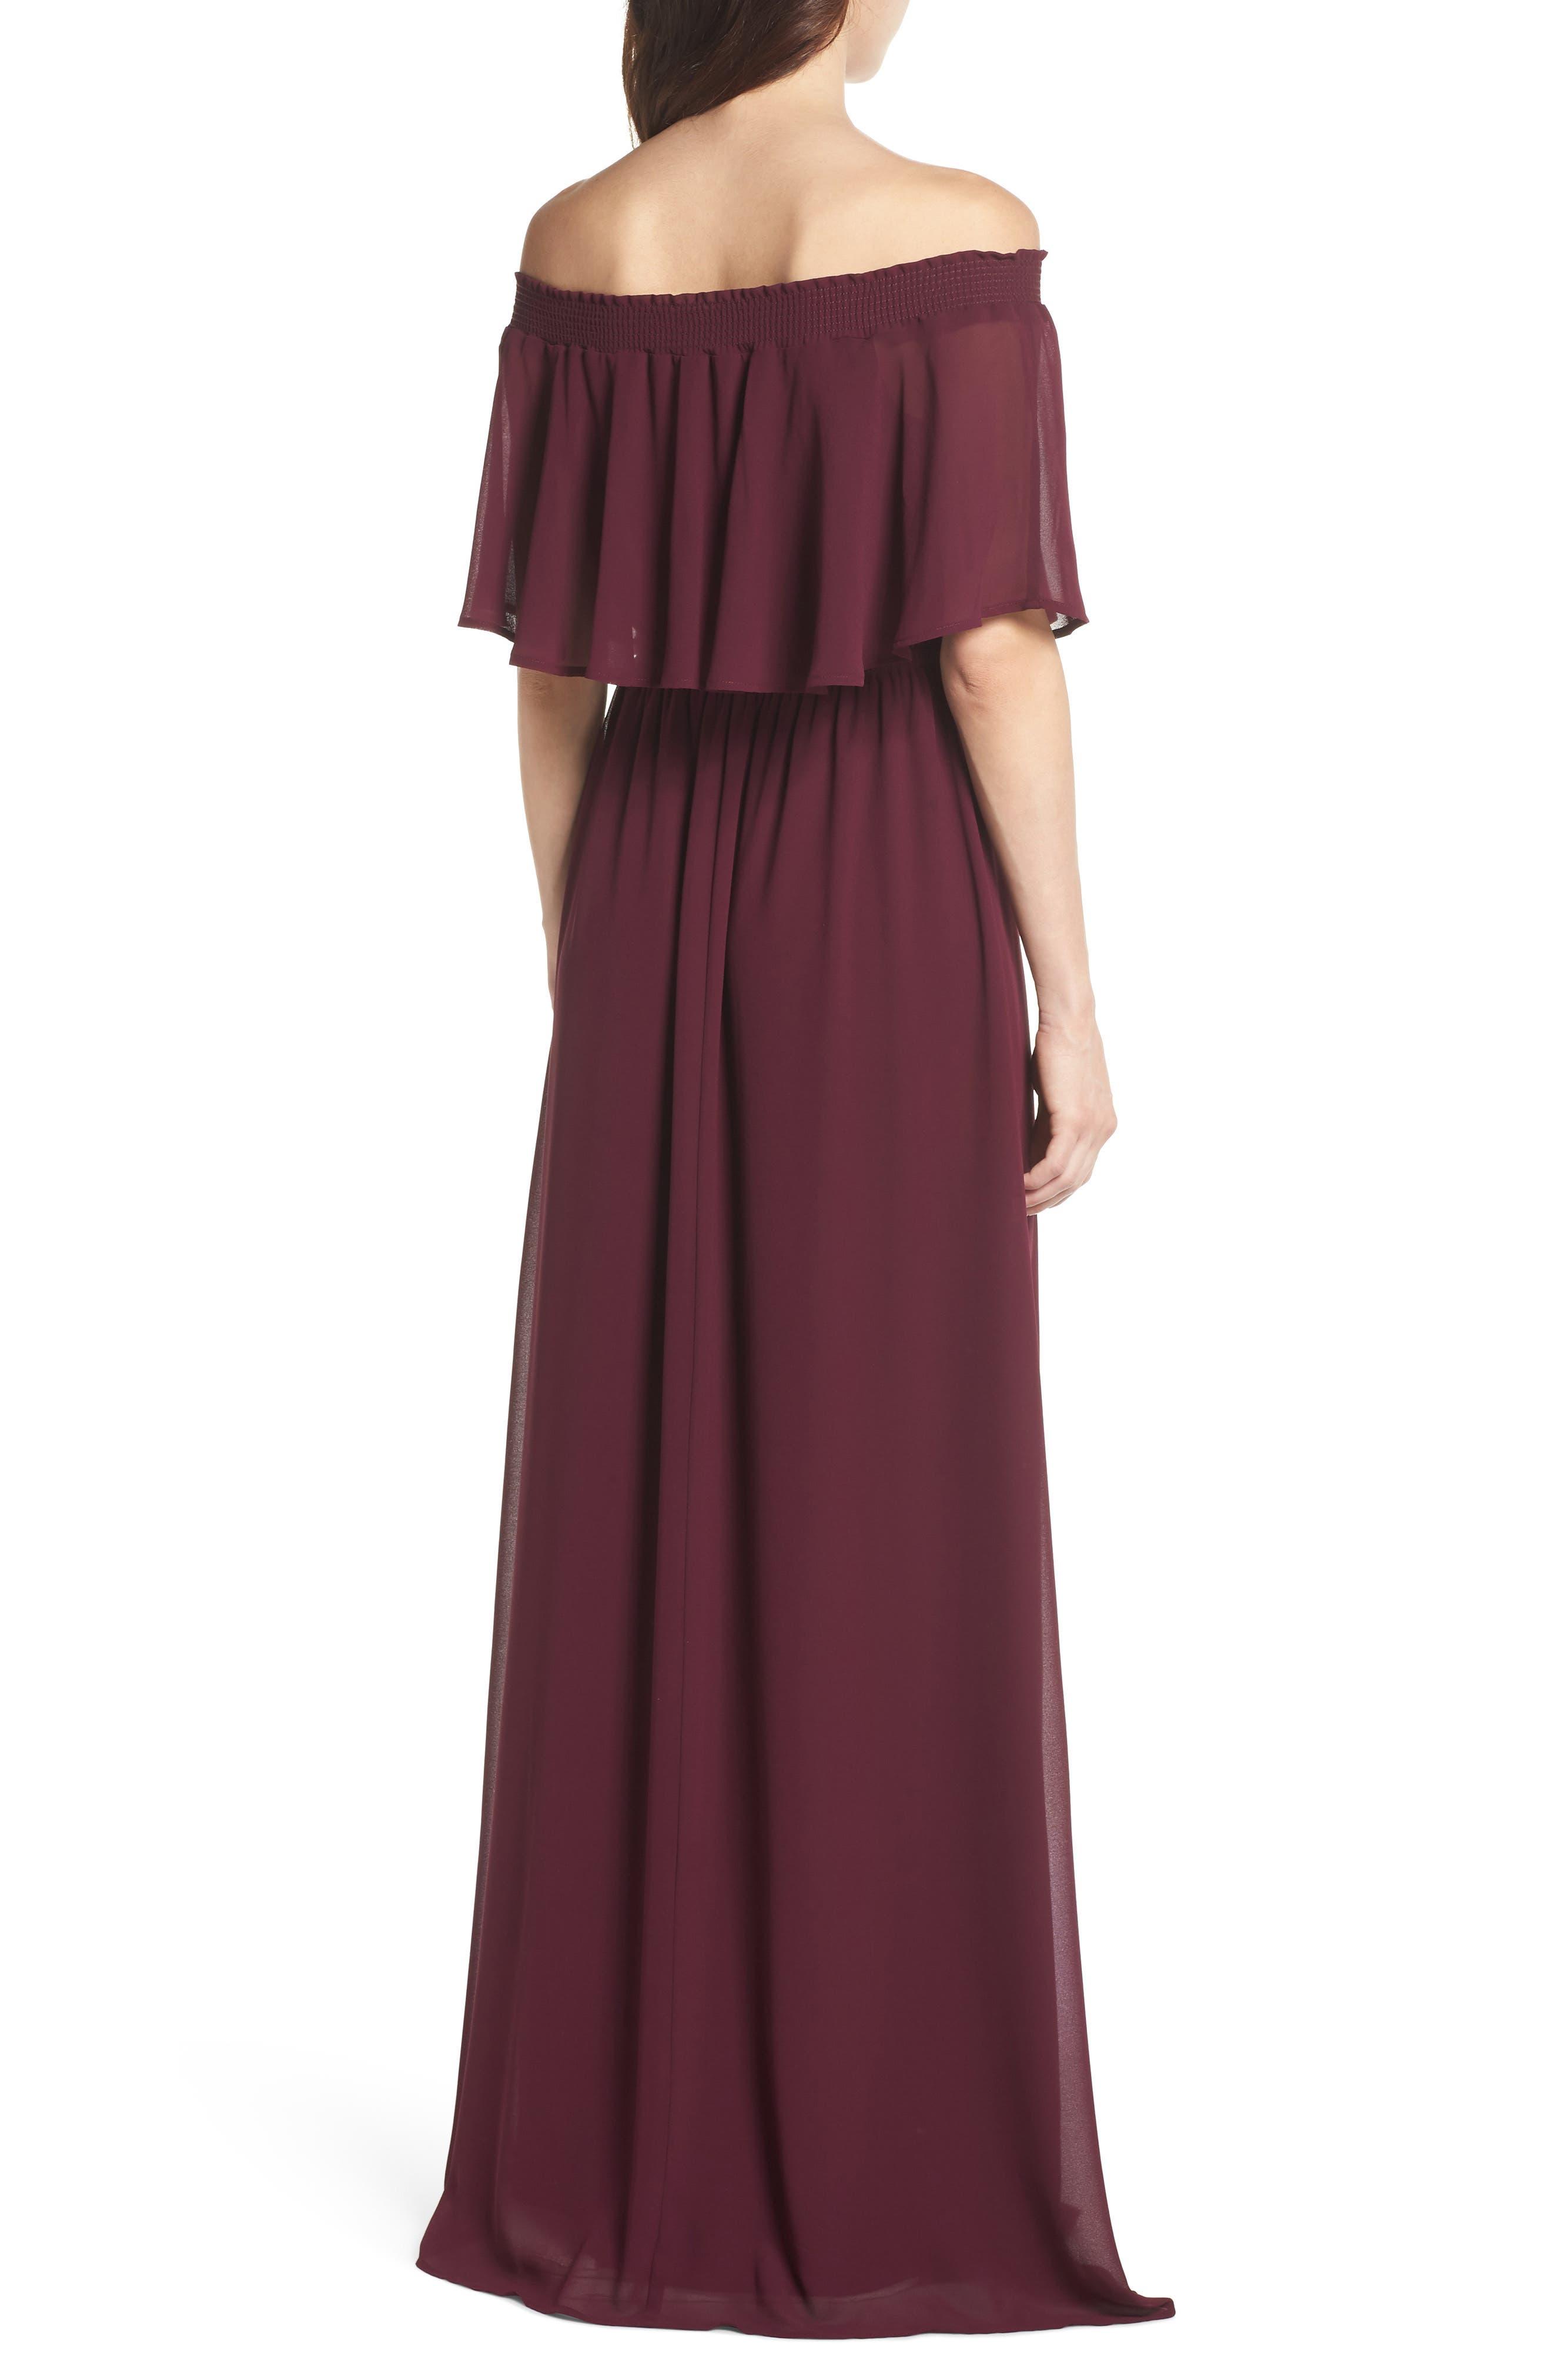 Hacienda Convertible Gown,                             Alternate thumbnail 2, color,                             MERLOT CHIFFON